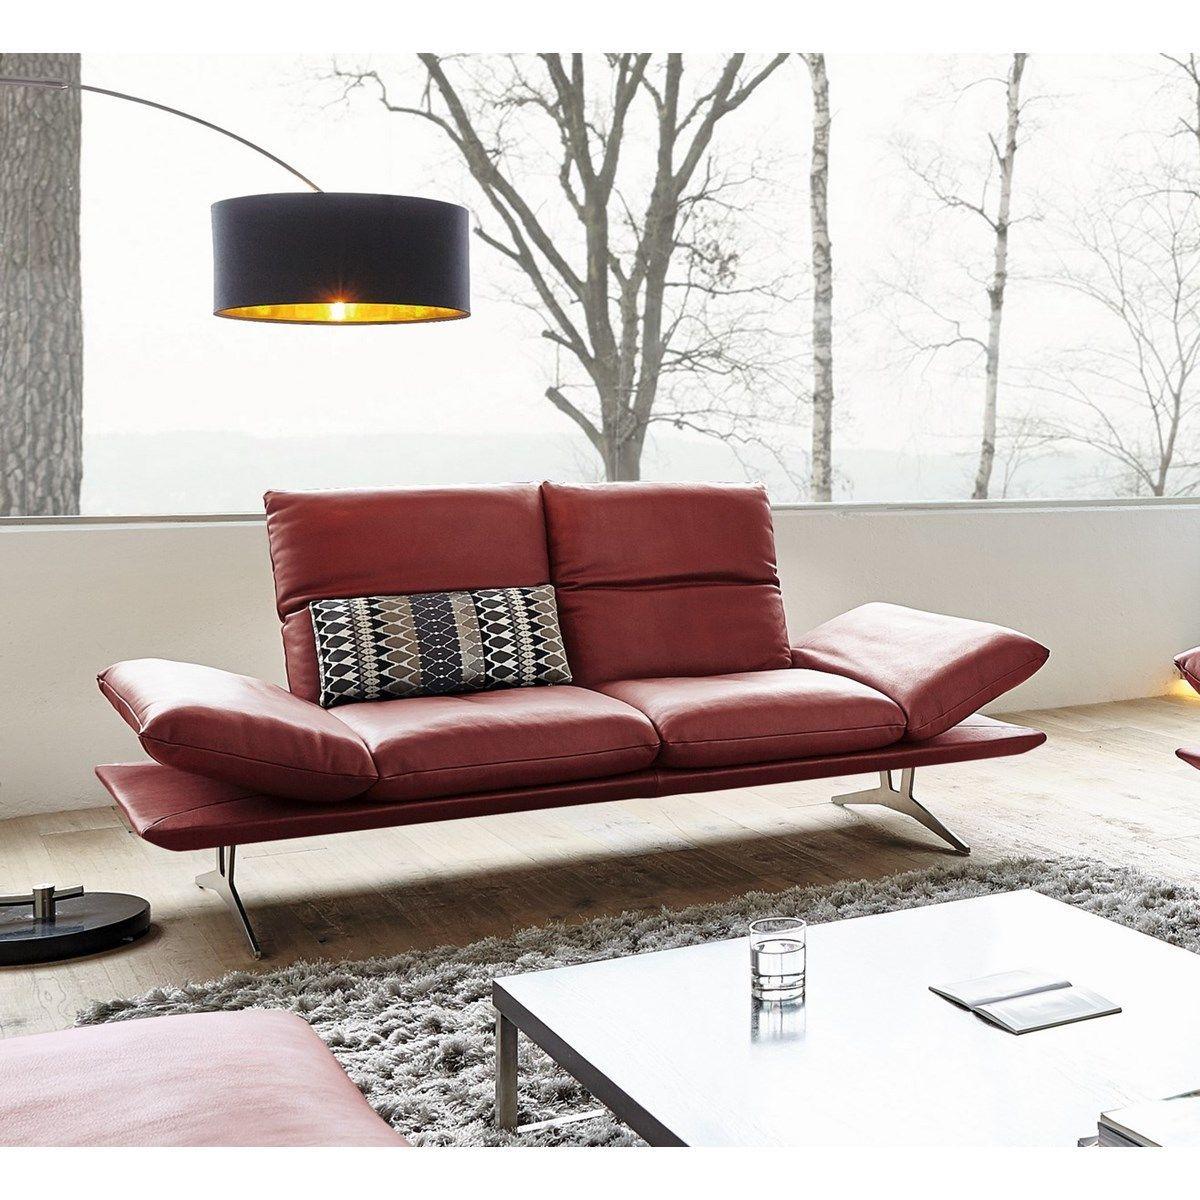 Canape 2 Places Ad Senso Canape Cuir Design Canape Cuir Et